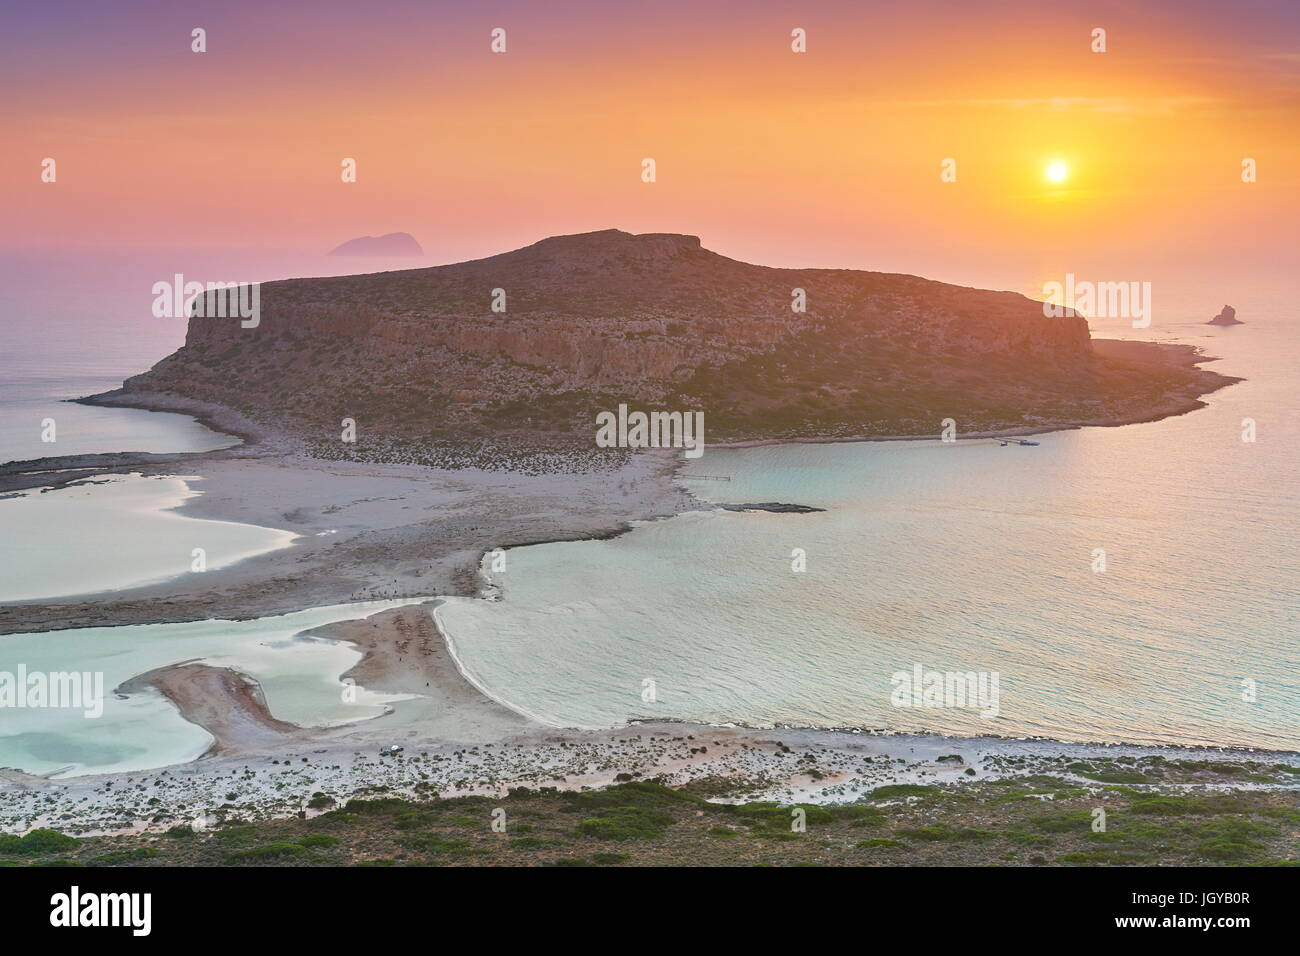 Sunset at Balos Beach, Gramvousa Peninsula, Crete Island, Greece - Stock Image